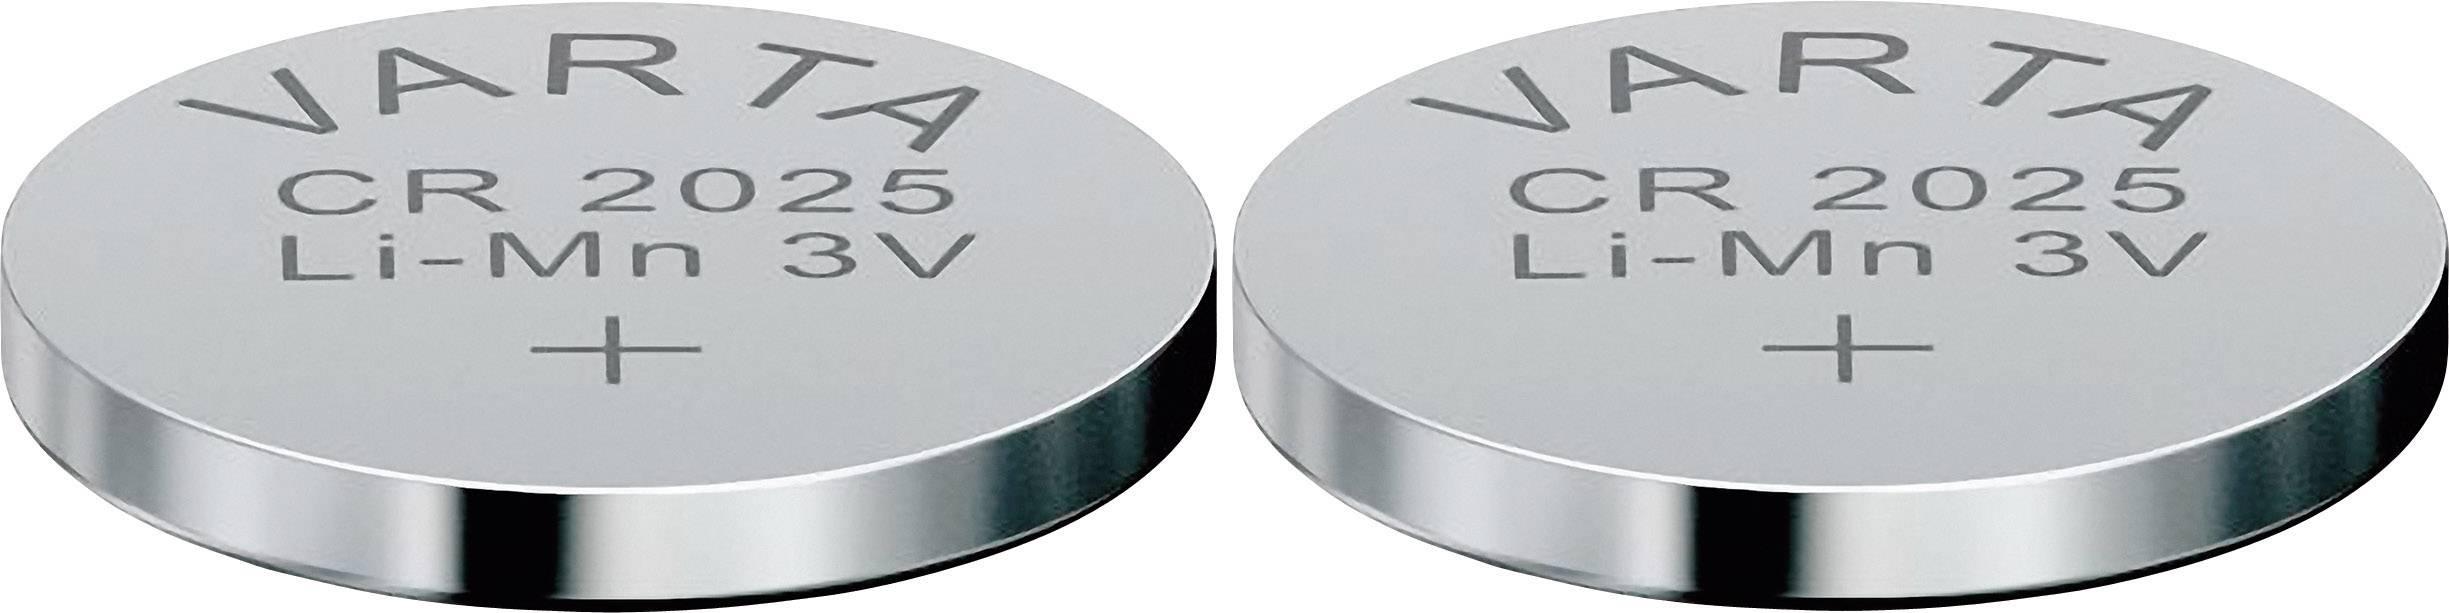 Gombíková batéria Varta CR 2025, lítium, 2ks, 6025101402